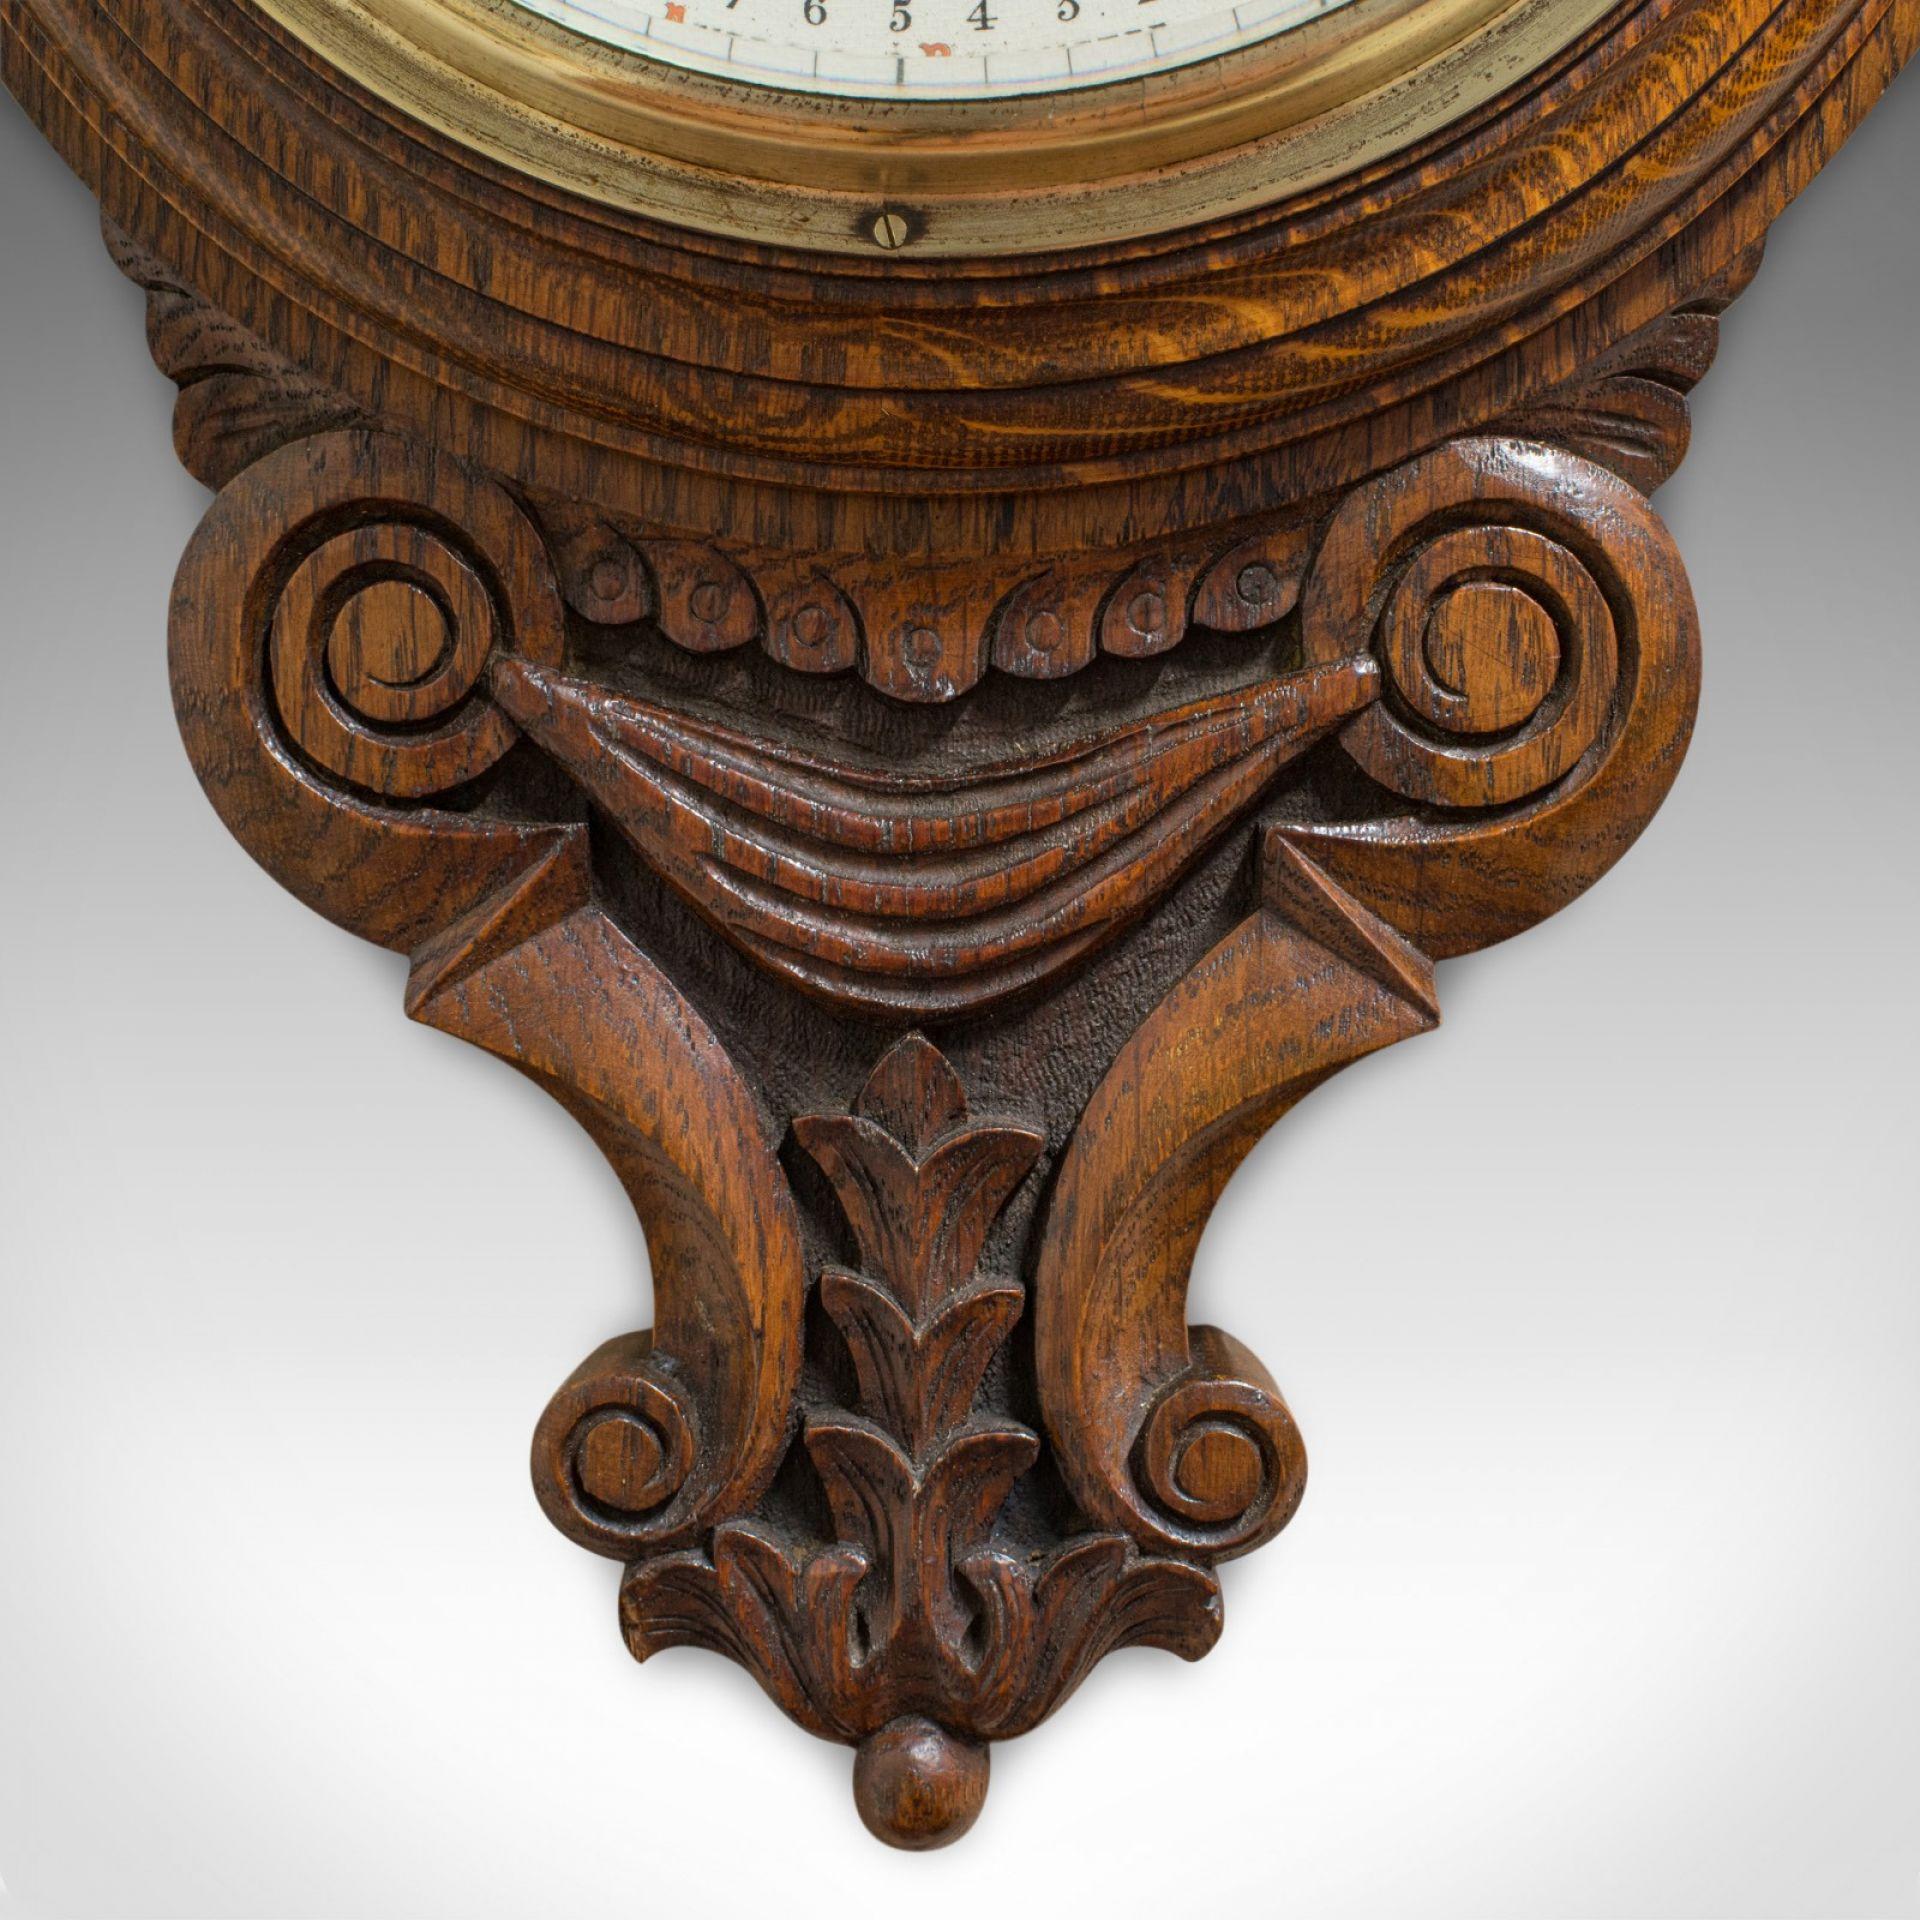 Antique Aneroid Barometer, English, Oak, Banjo, CSSA Ltd, London, Circa 1910